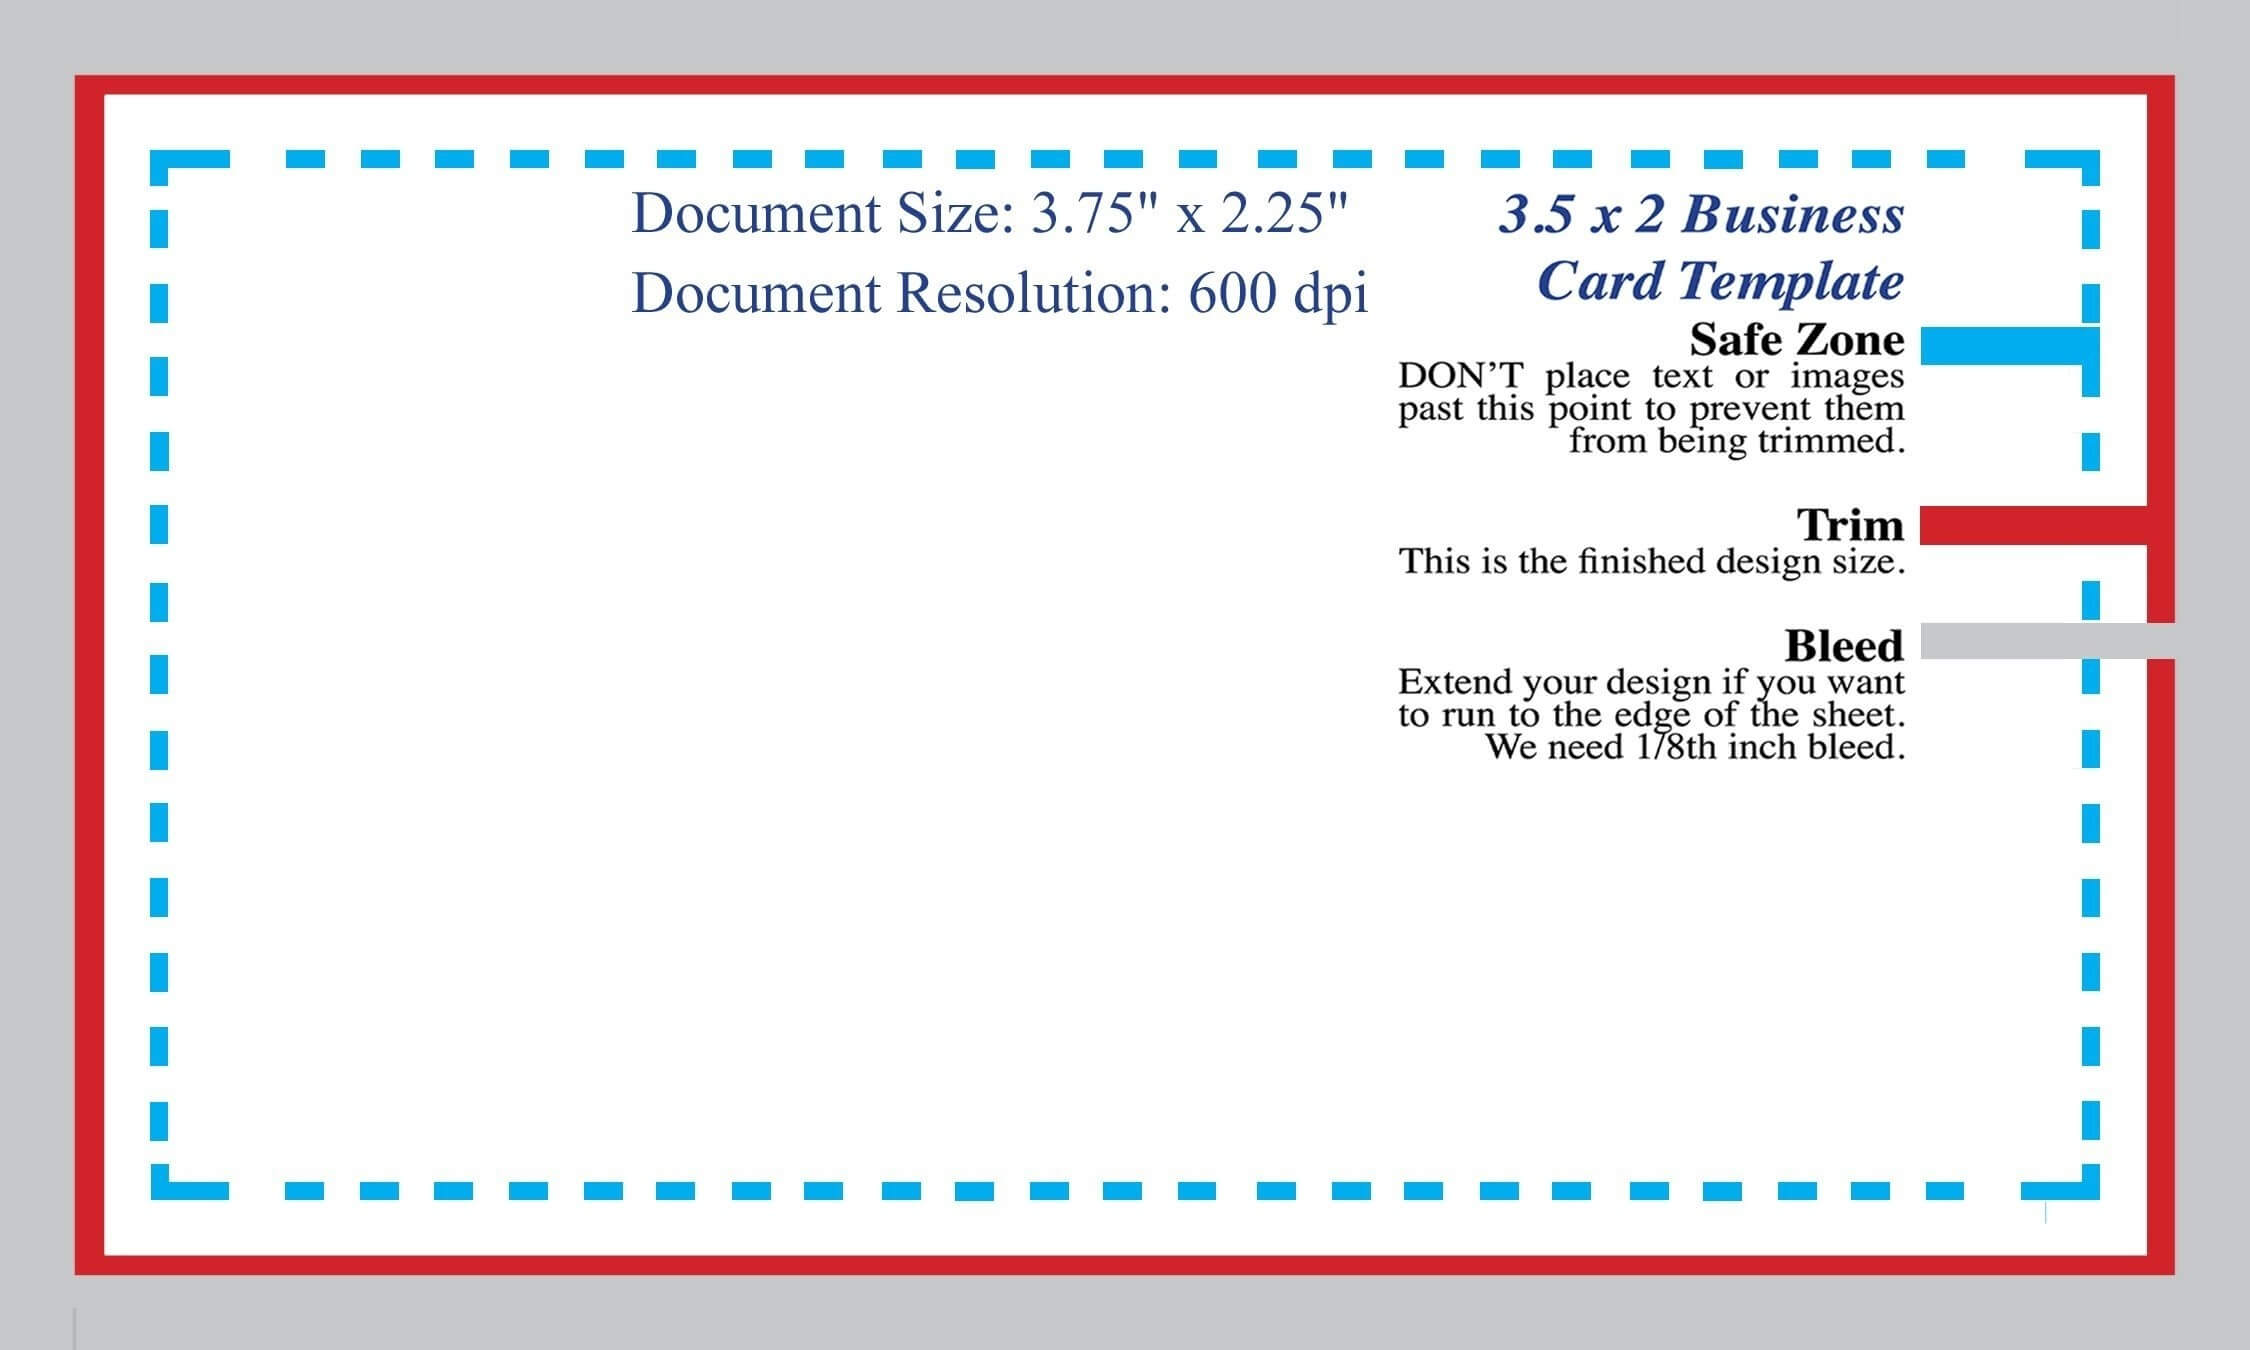 032 Blank Business Card Template Free Ideas Psd Photoshop With Regard To Business Card Template Size Photoshop